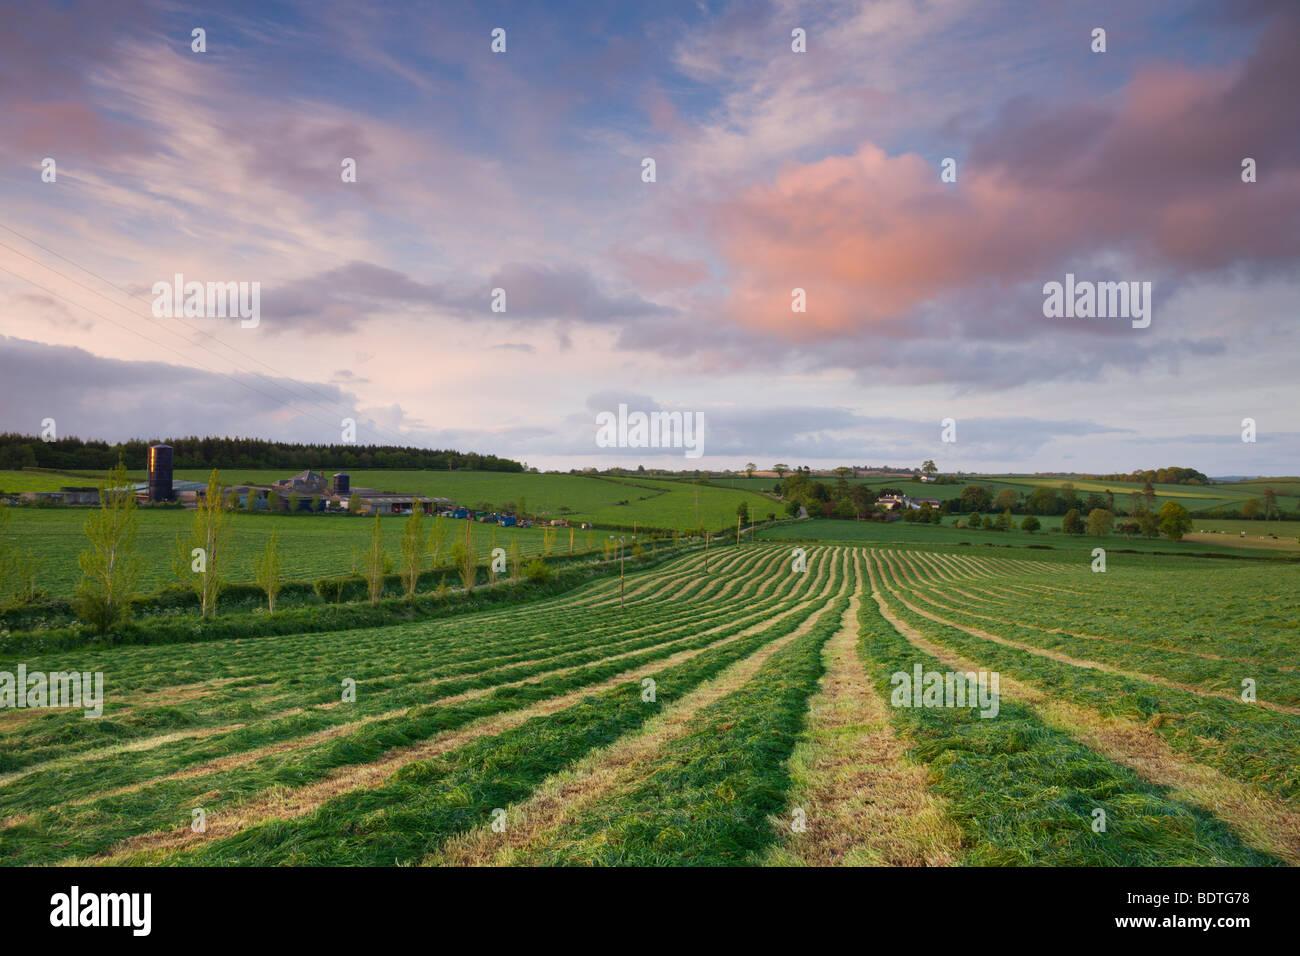 Freshly cut grass in a rural Devonshire field, Morchard Bishop, Devon, England. Spring (May) 2009 - Stock Image